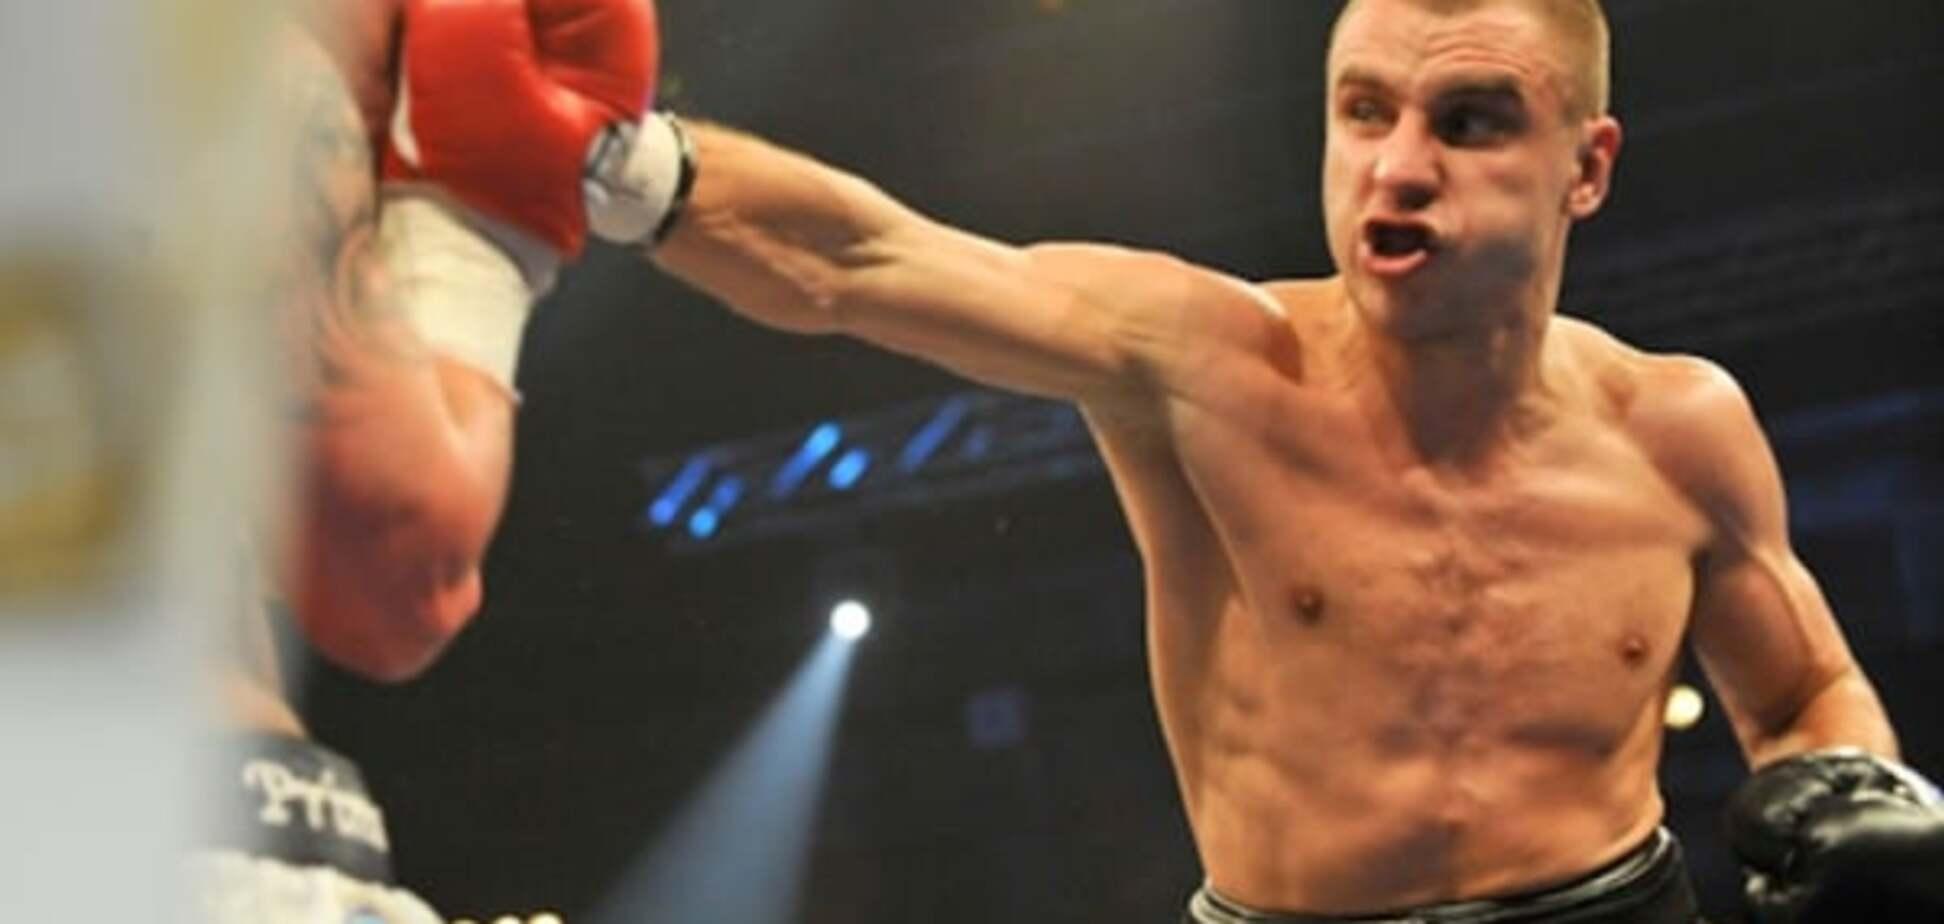 Украинский боксер подписал контракт на бой за титул чемпиона мира